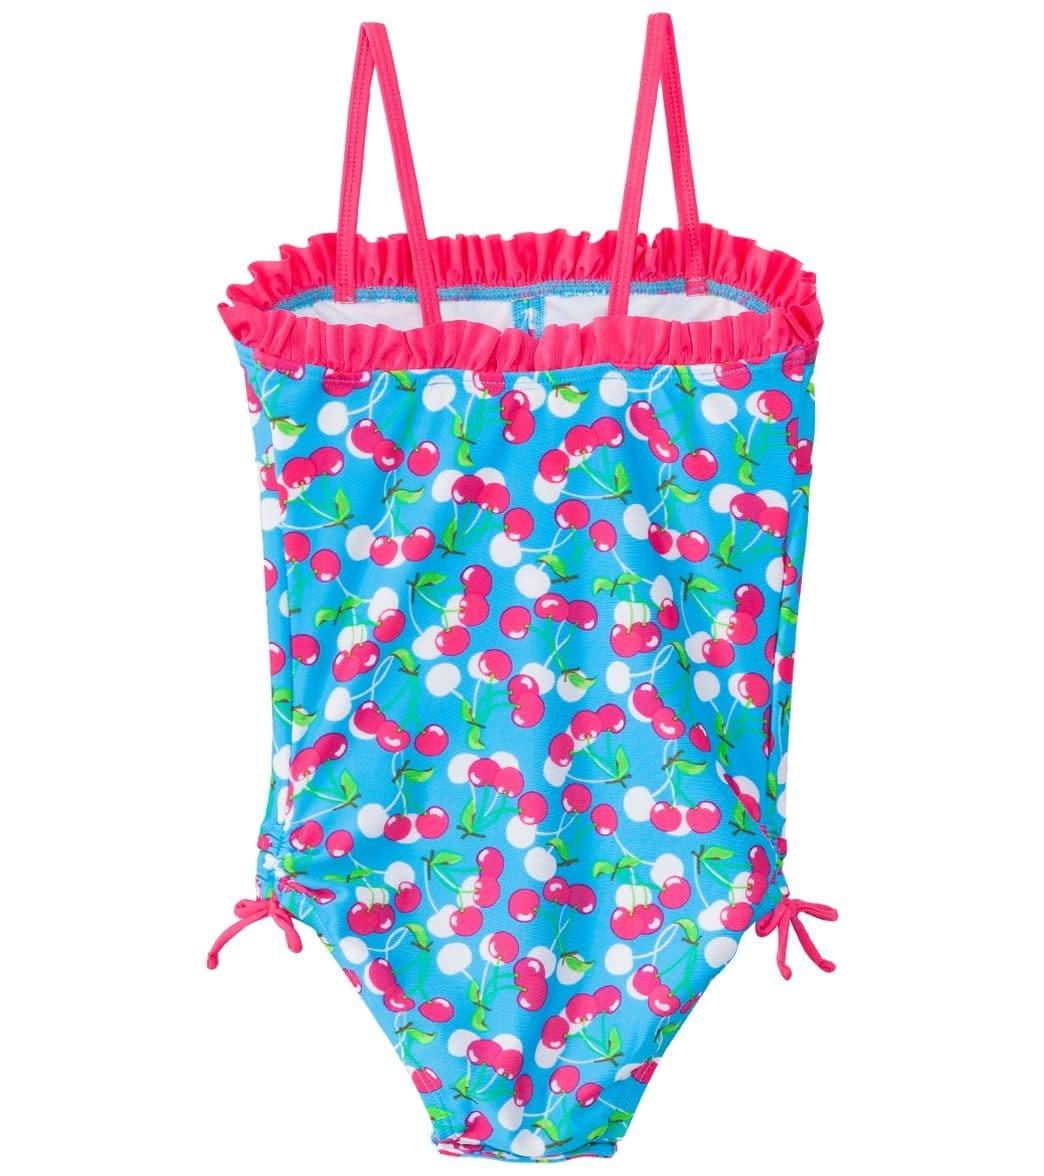 94feb711841ef SnapMe Girls' Very Cherry Ruffle One Piece Swimsuit UVP 50+ (6mos-8yrs